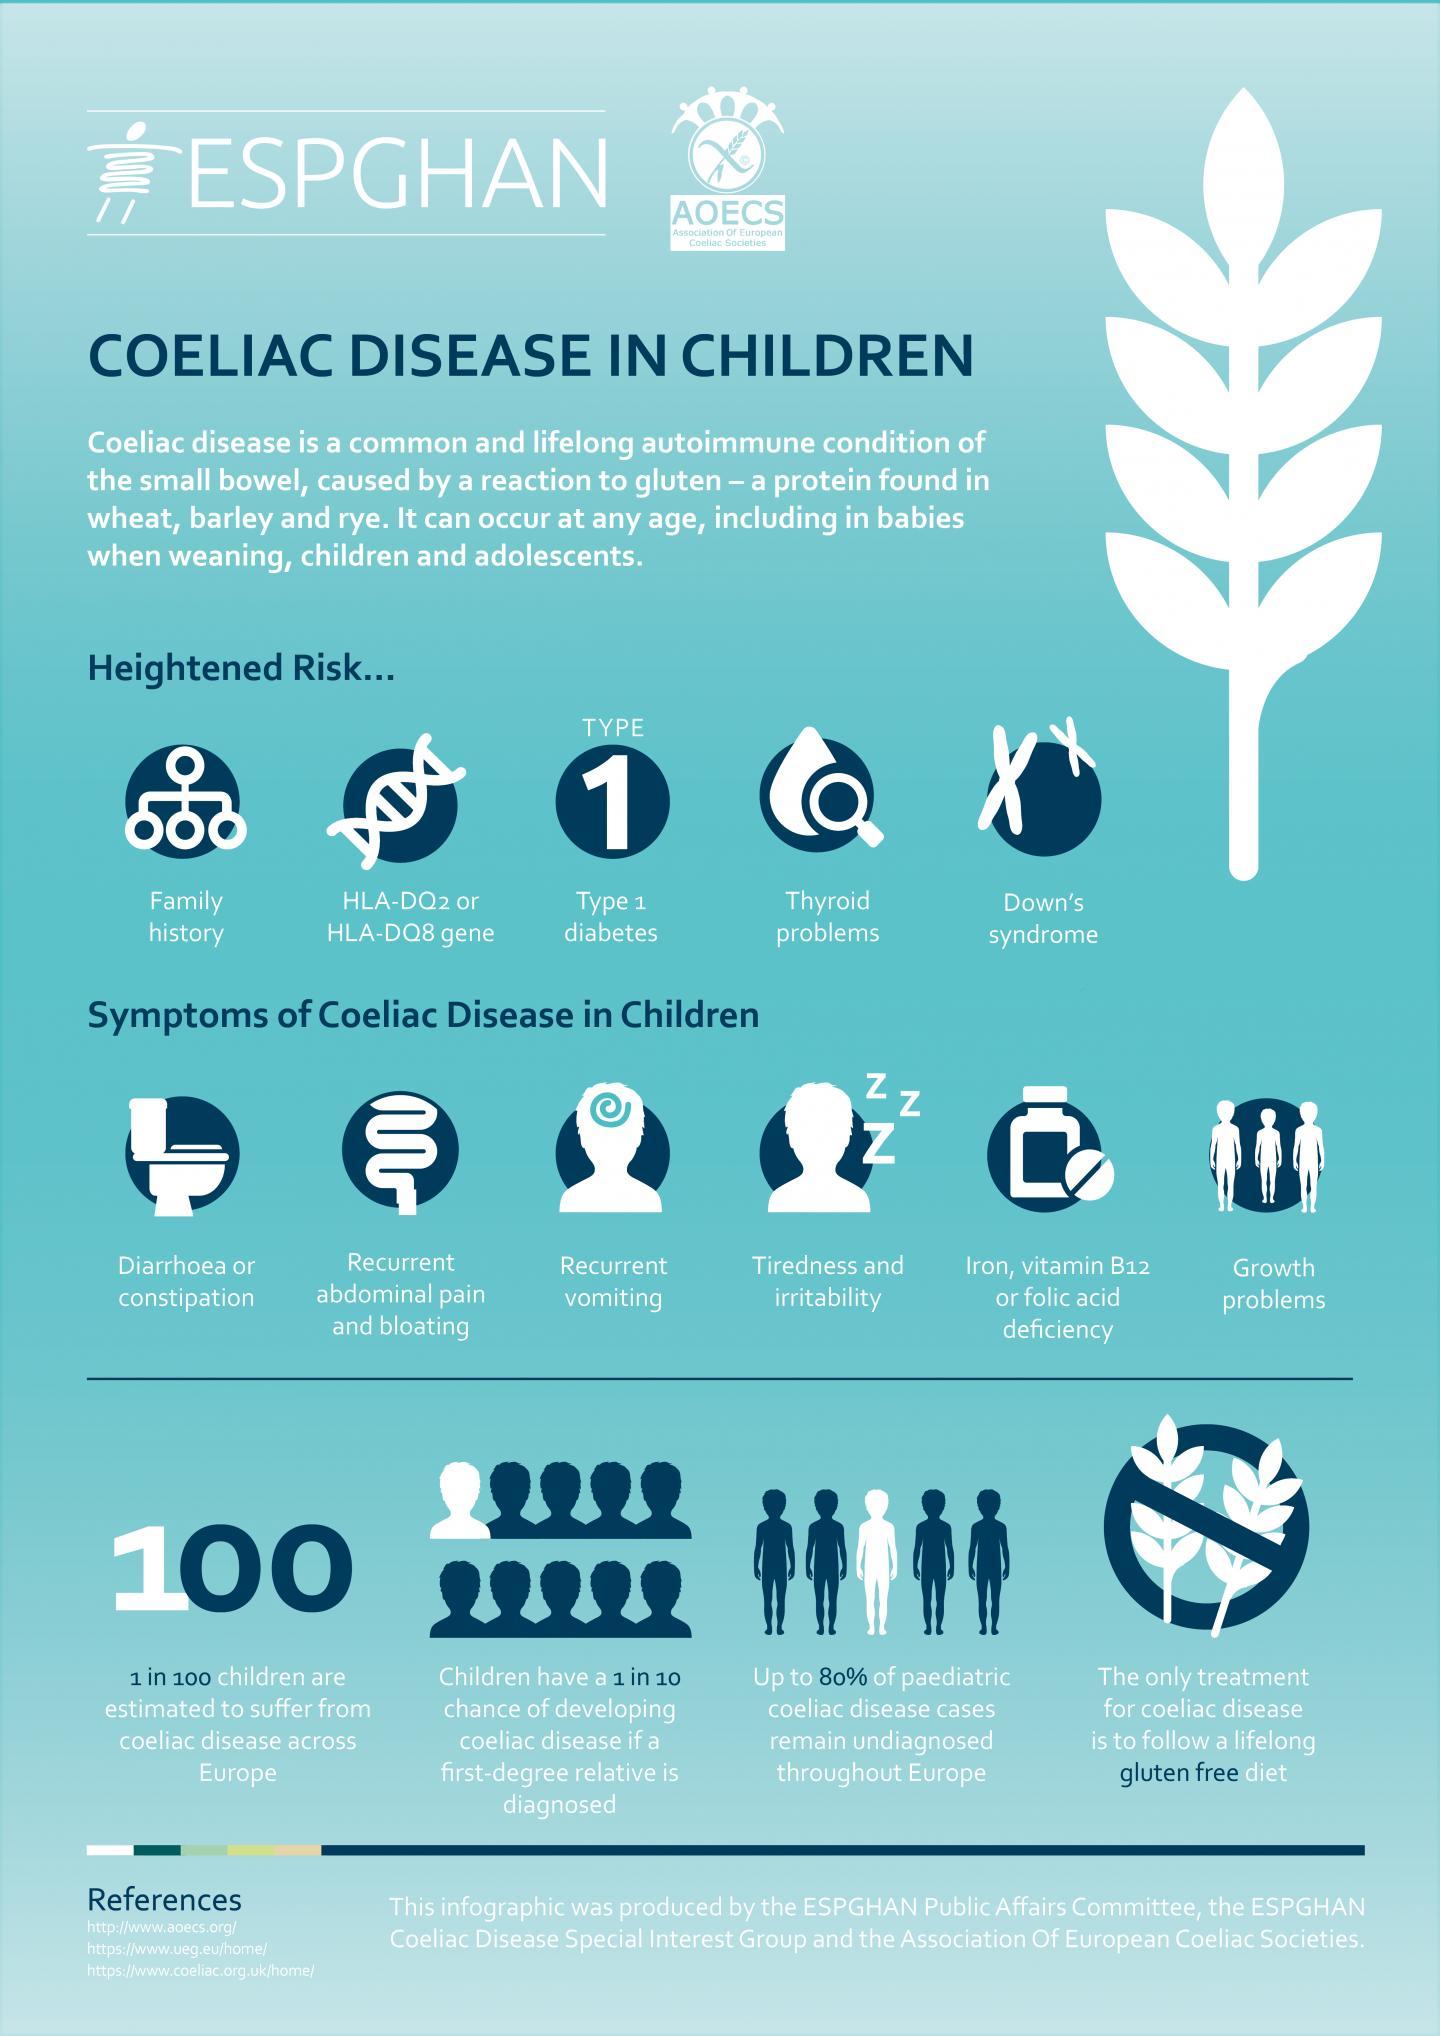 High fiber during pregnancy reduces risk of celiac disease in children, research finds | EurekAlert! Science News